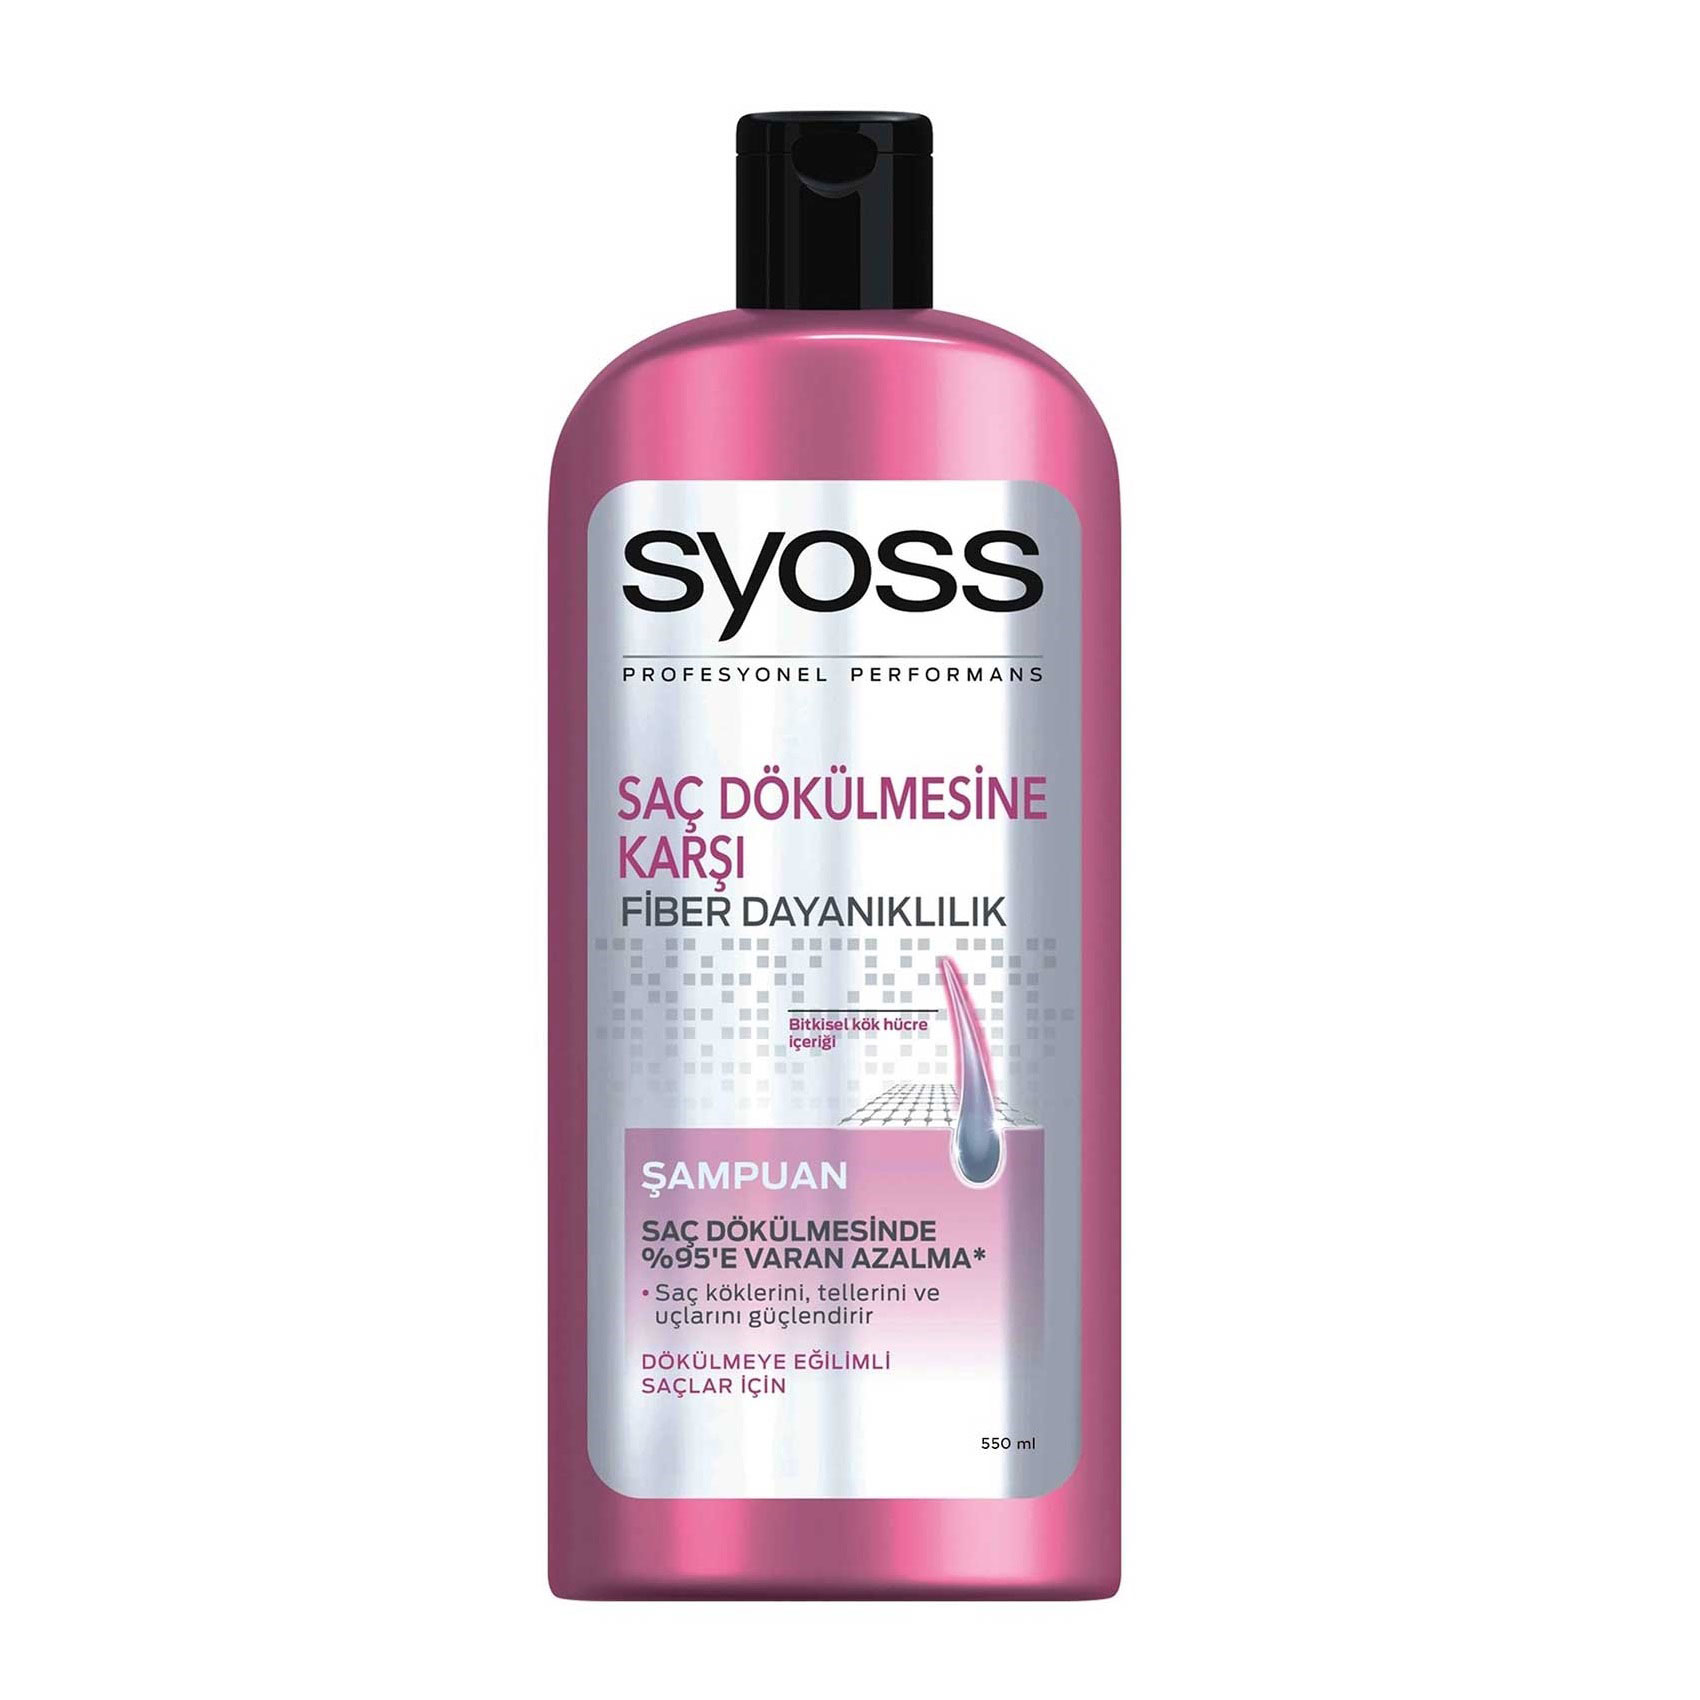 شامپو سایوس ضد ریزش مو Saç dökülmesine karşı حجم 550 میلی لیتر